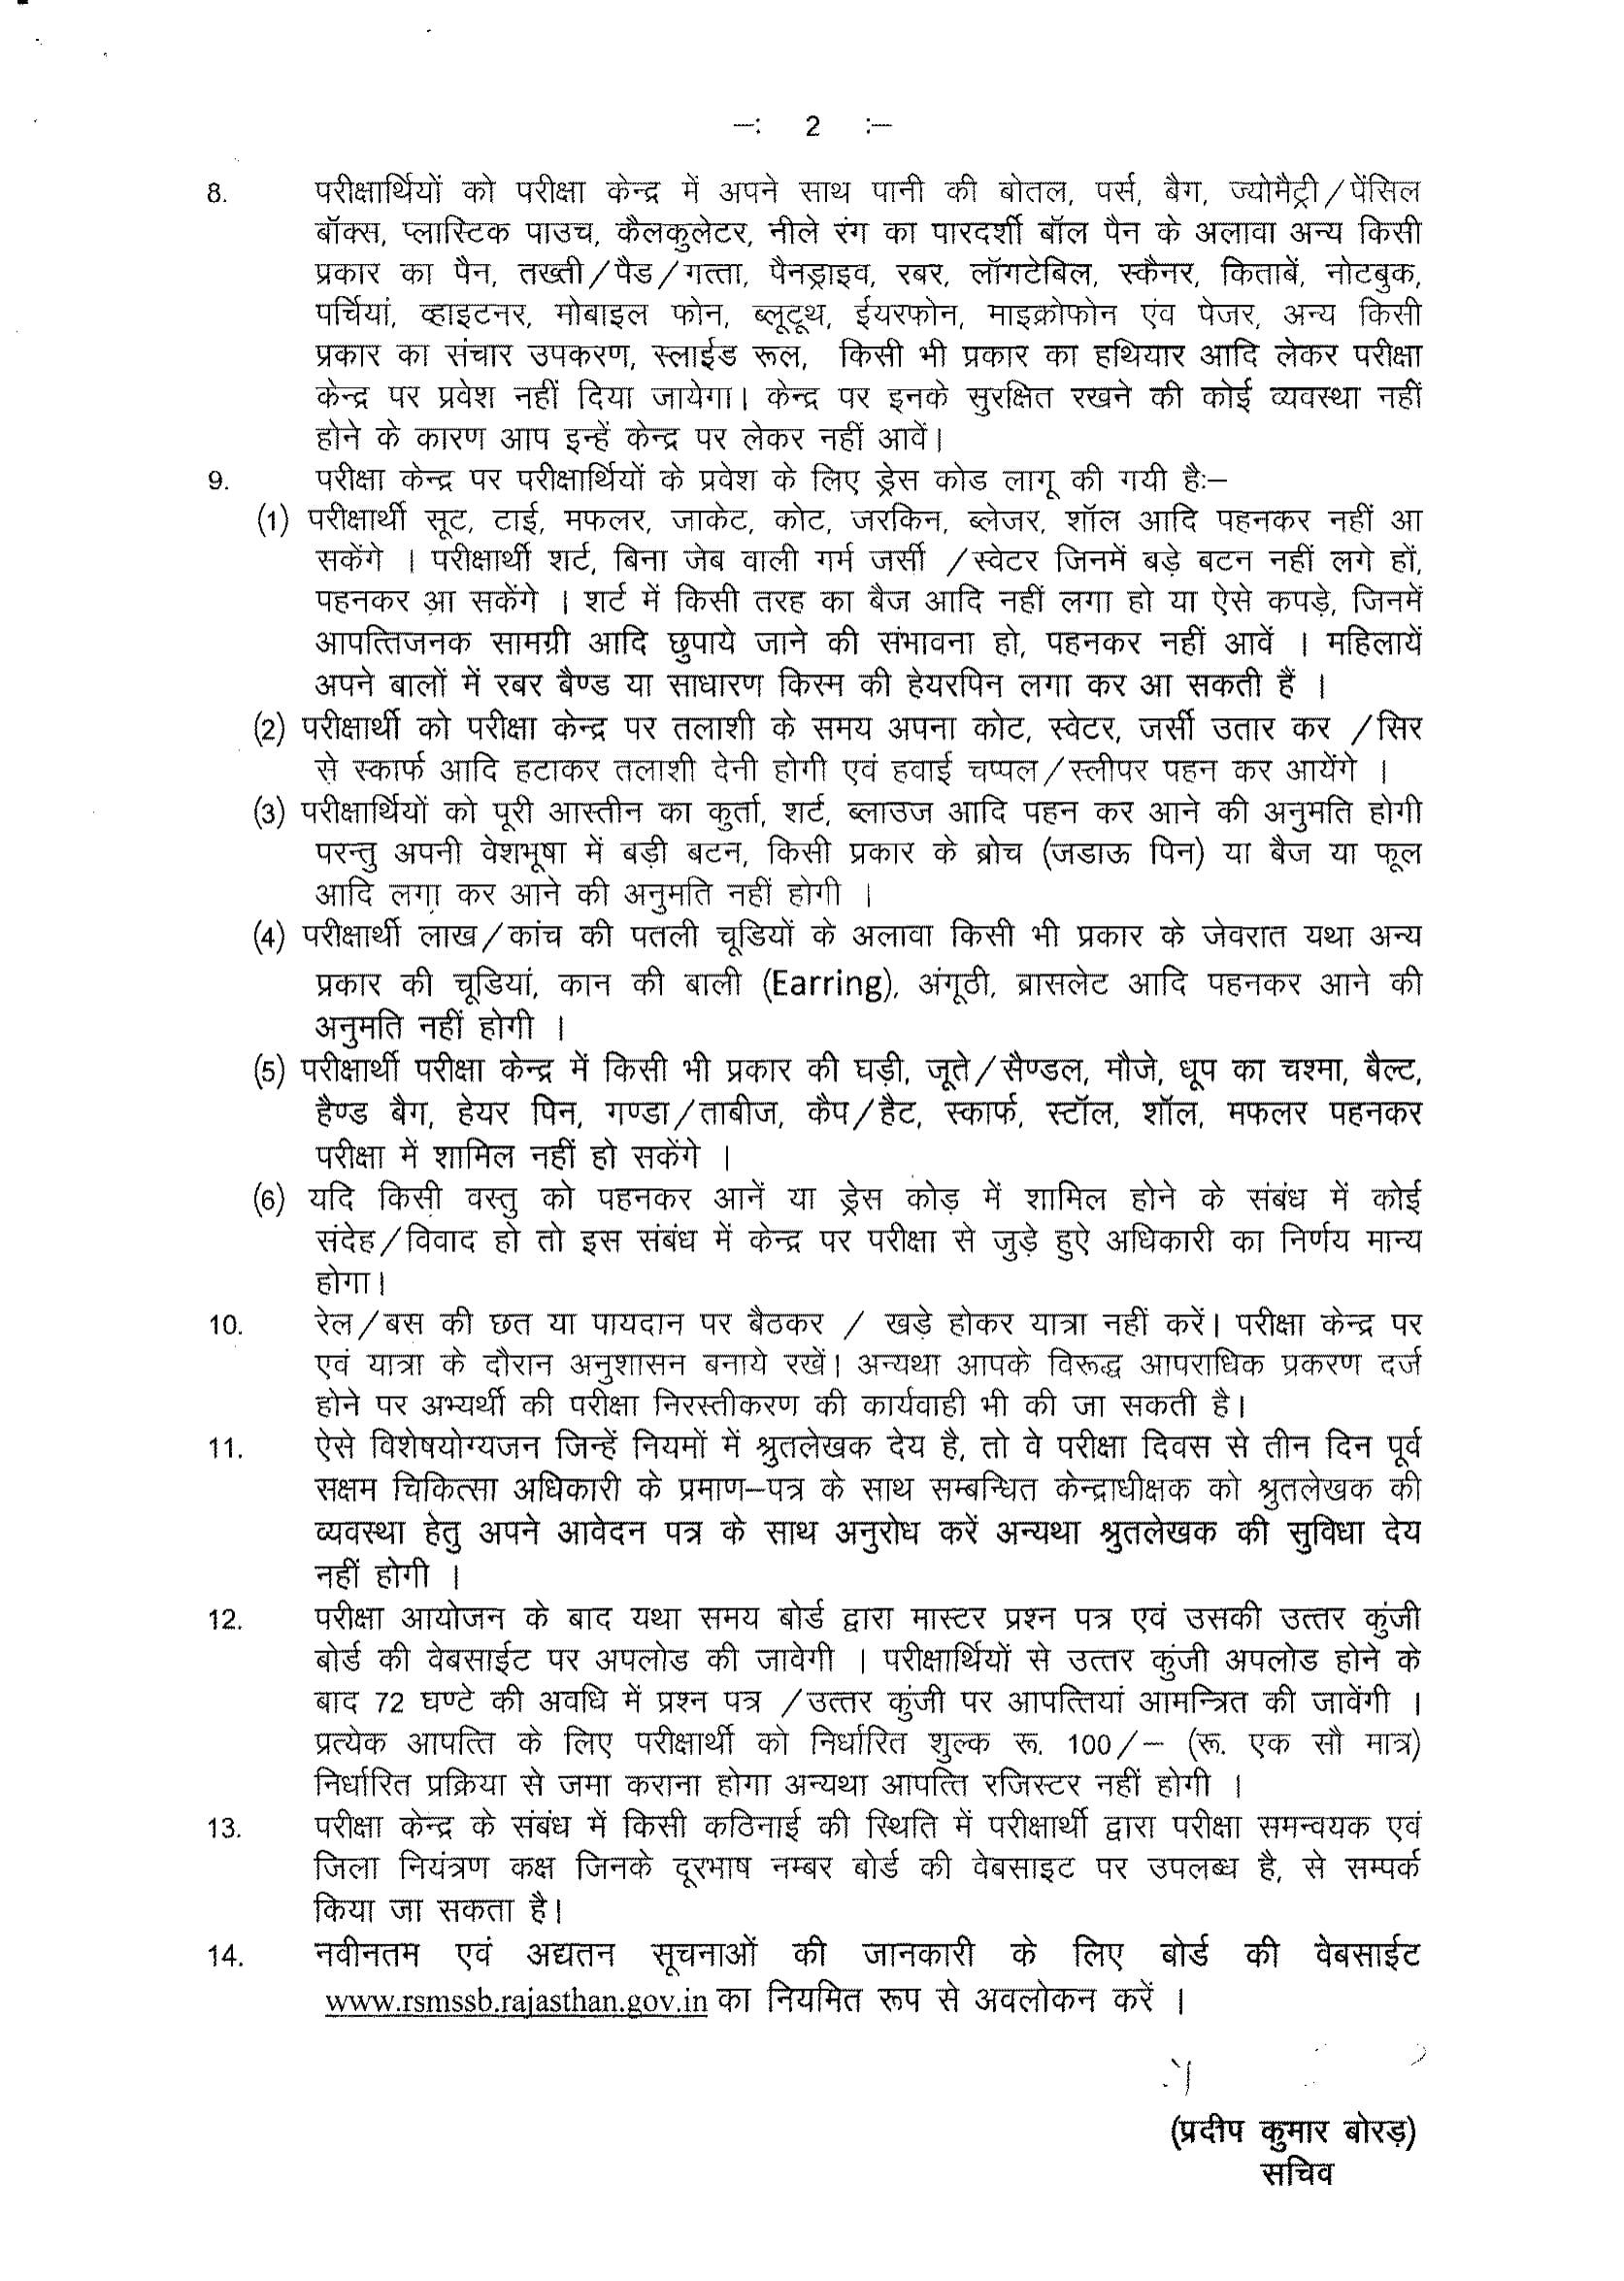 Rajasthan RSMSSB Lab Assistant Admit Card 2016